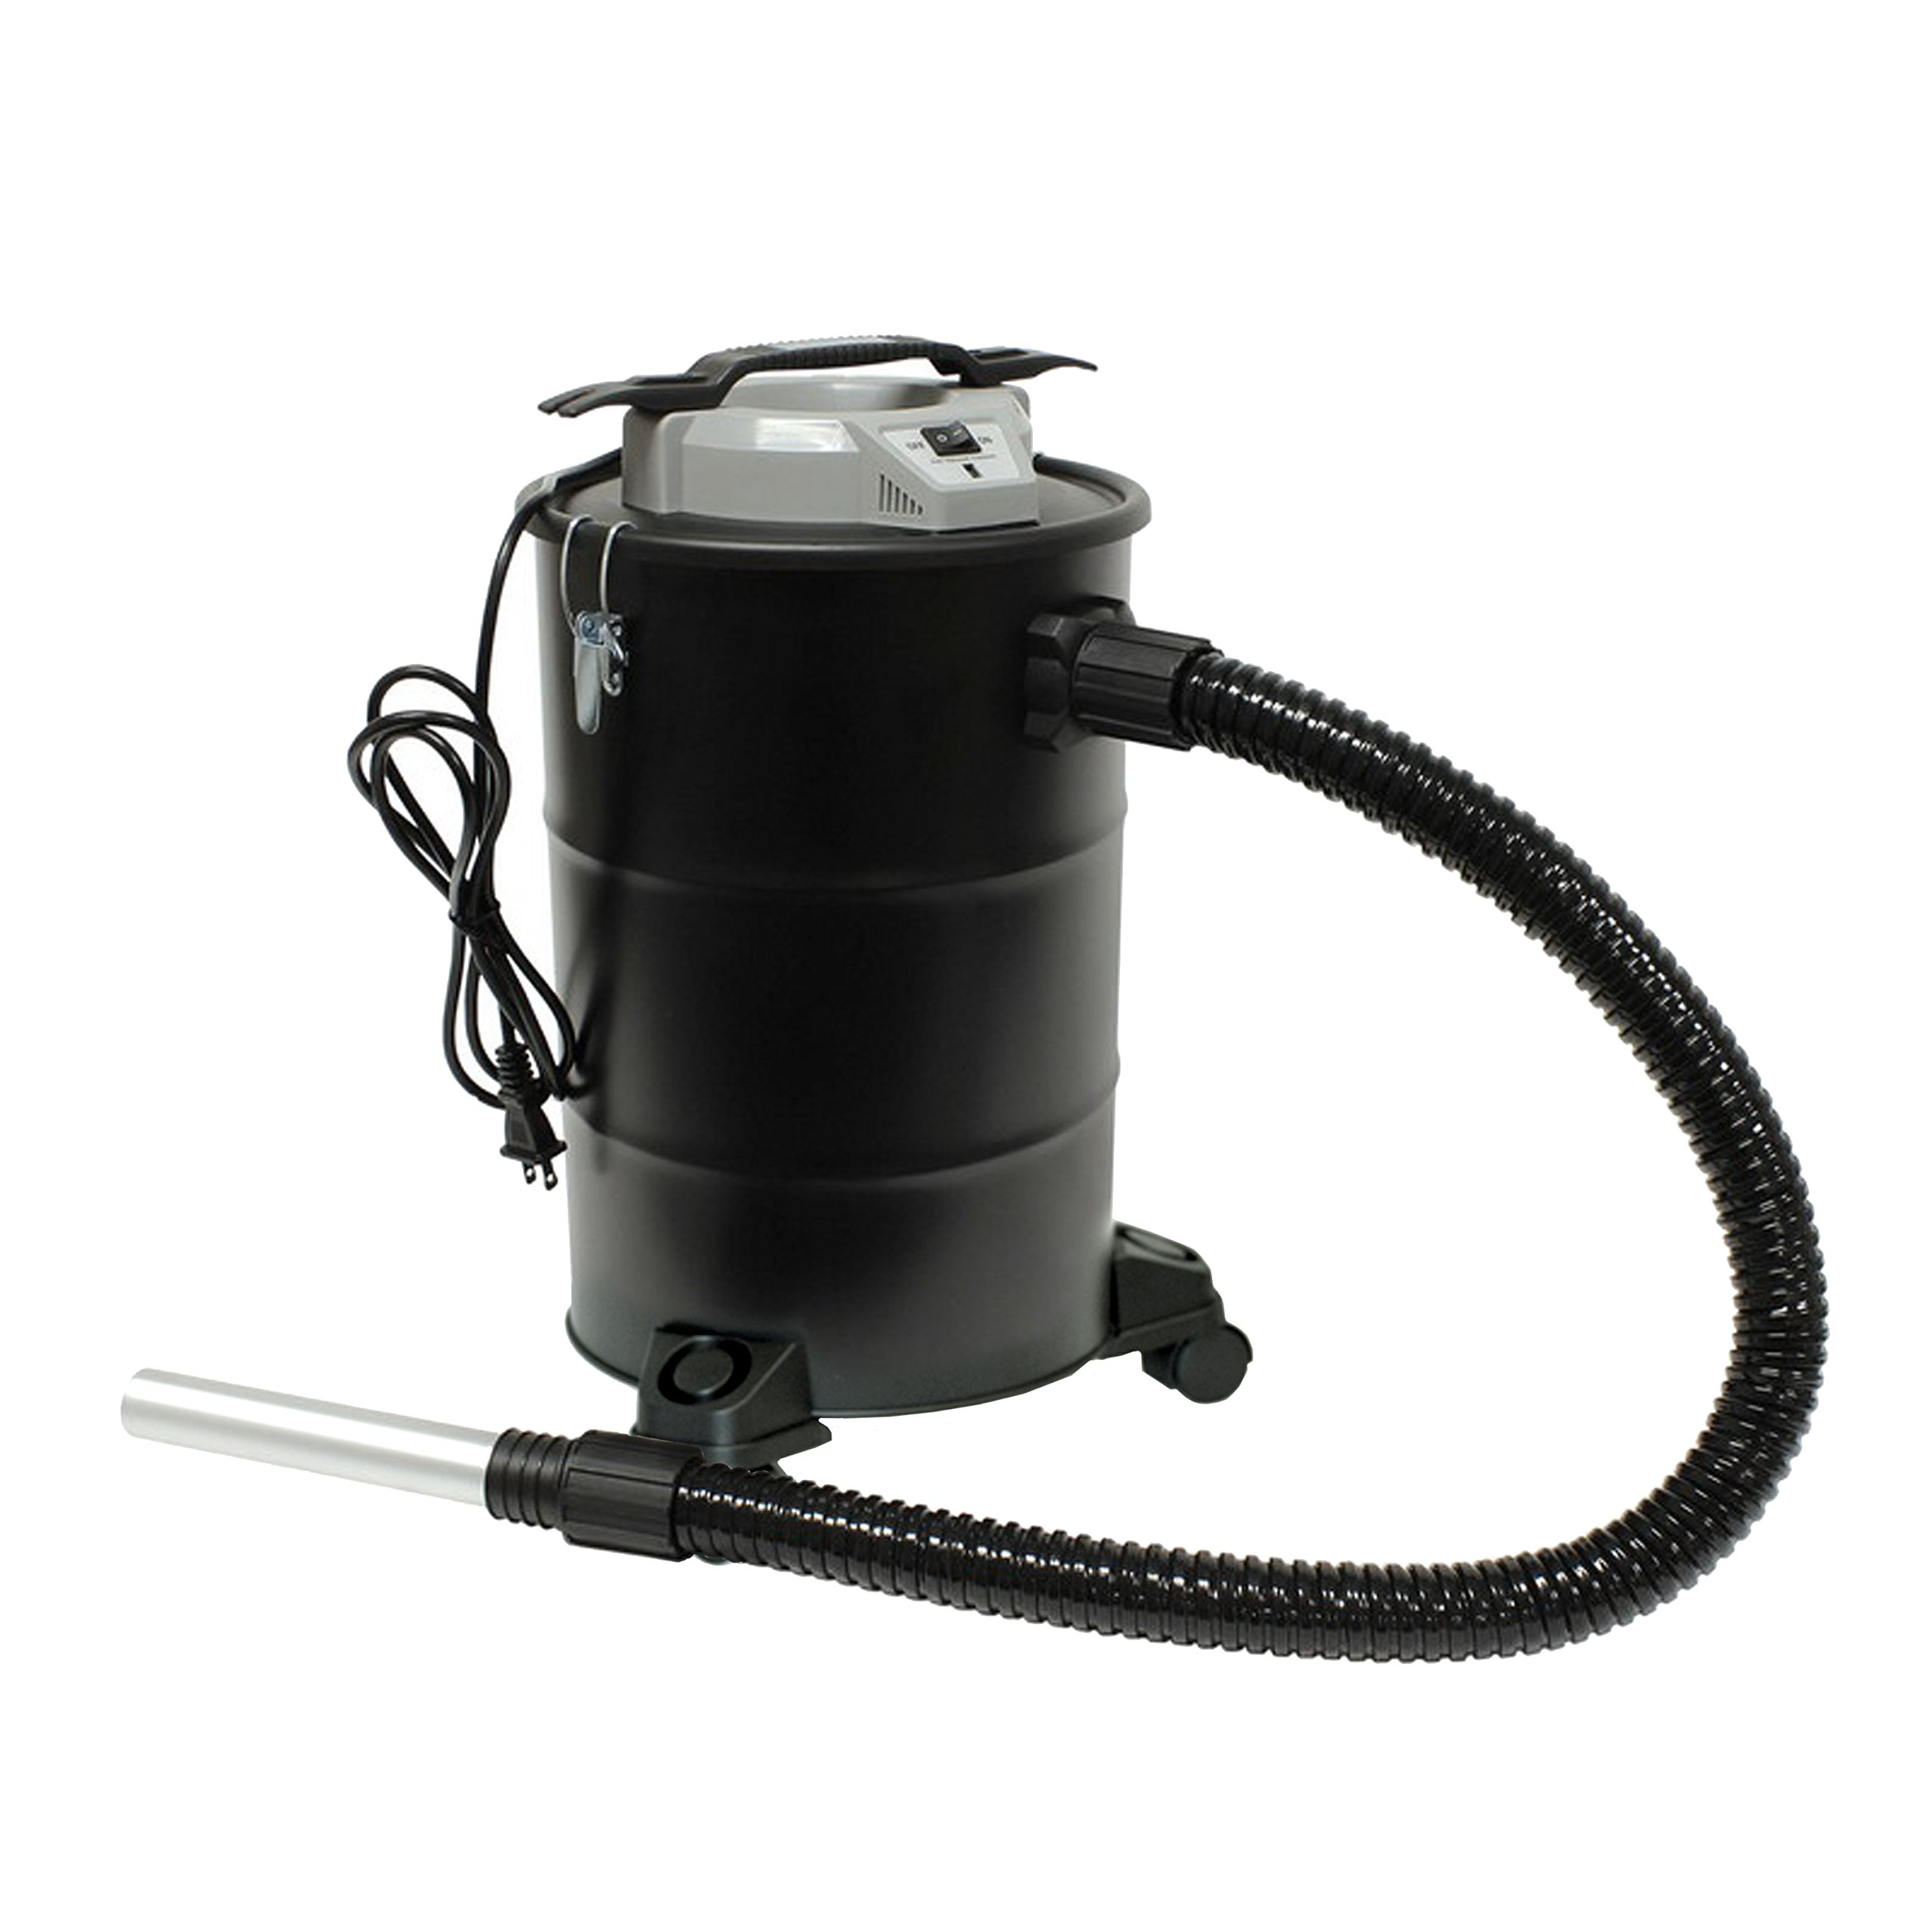 ALEKO APW212 ETL Approved Ash & Dust Multipurpose Vacuum Steel Body 5 Gallons